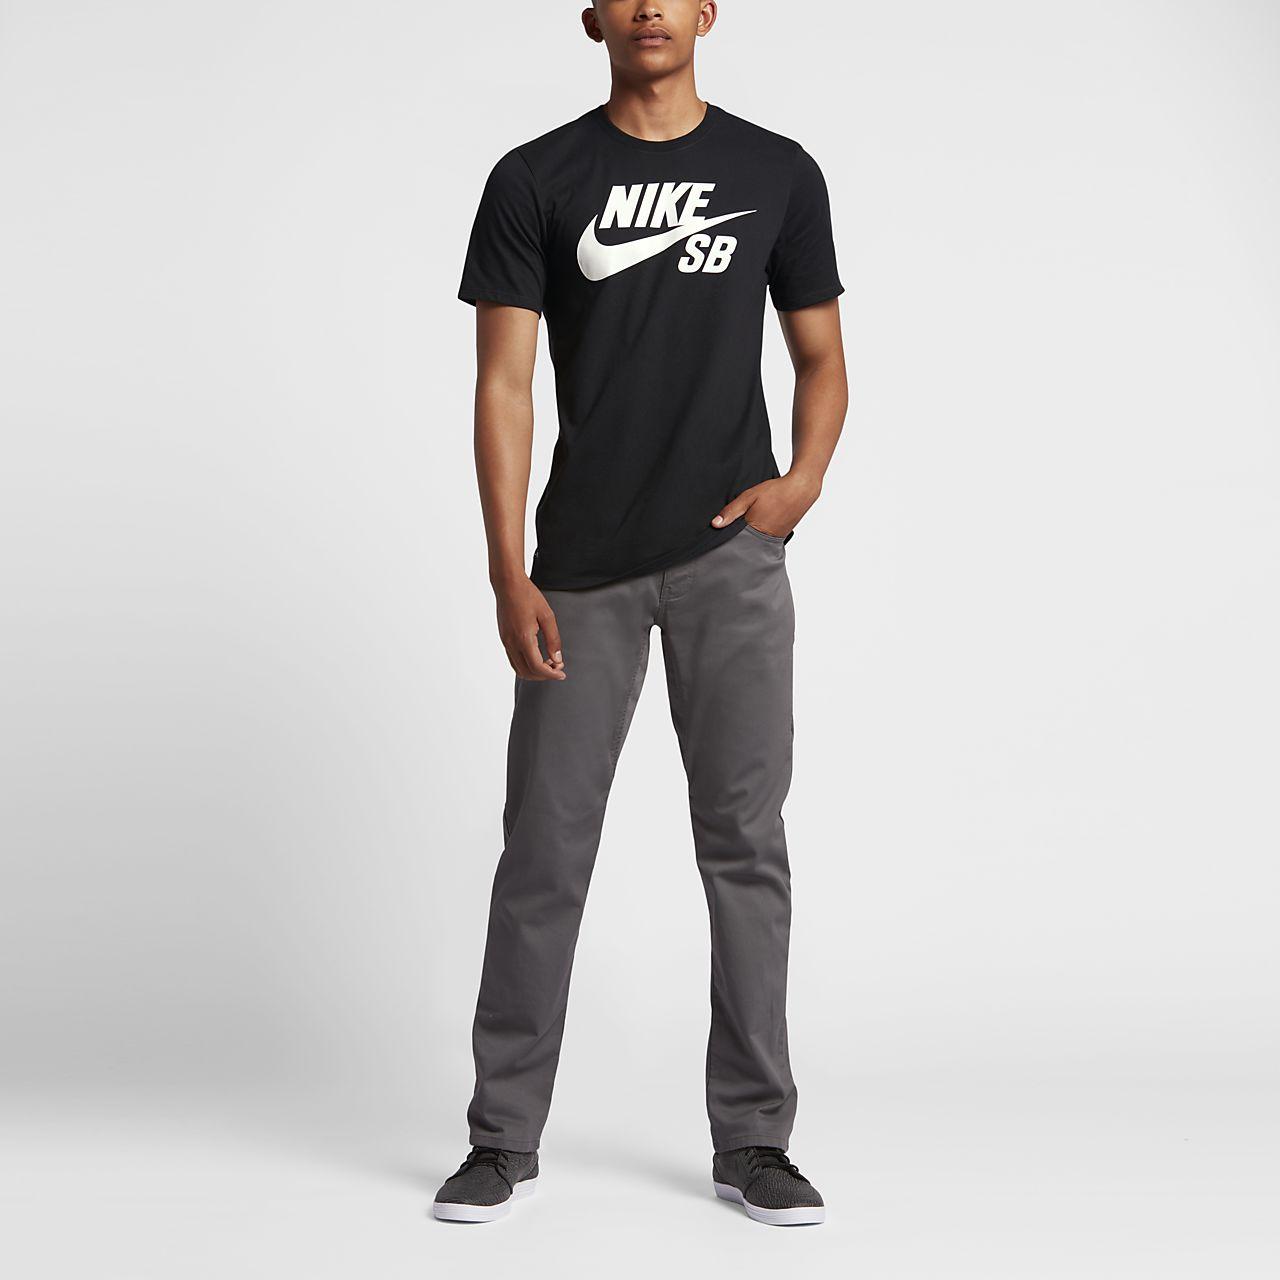 san francisco 9a2c8 c228a ... Nike SB Logo Men s T-Shirt